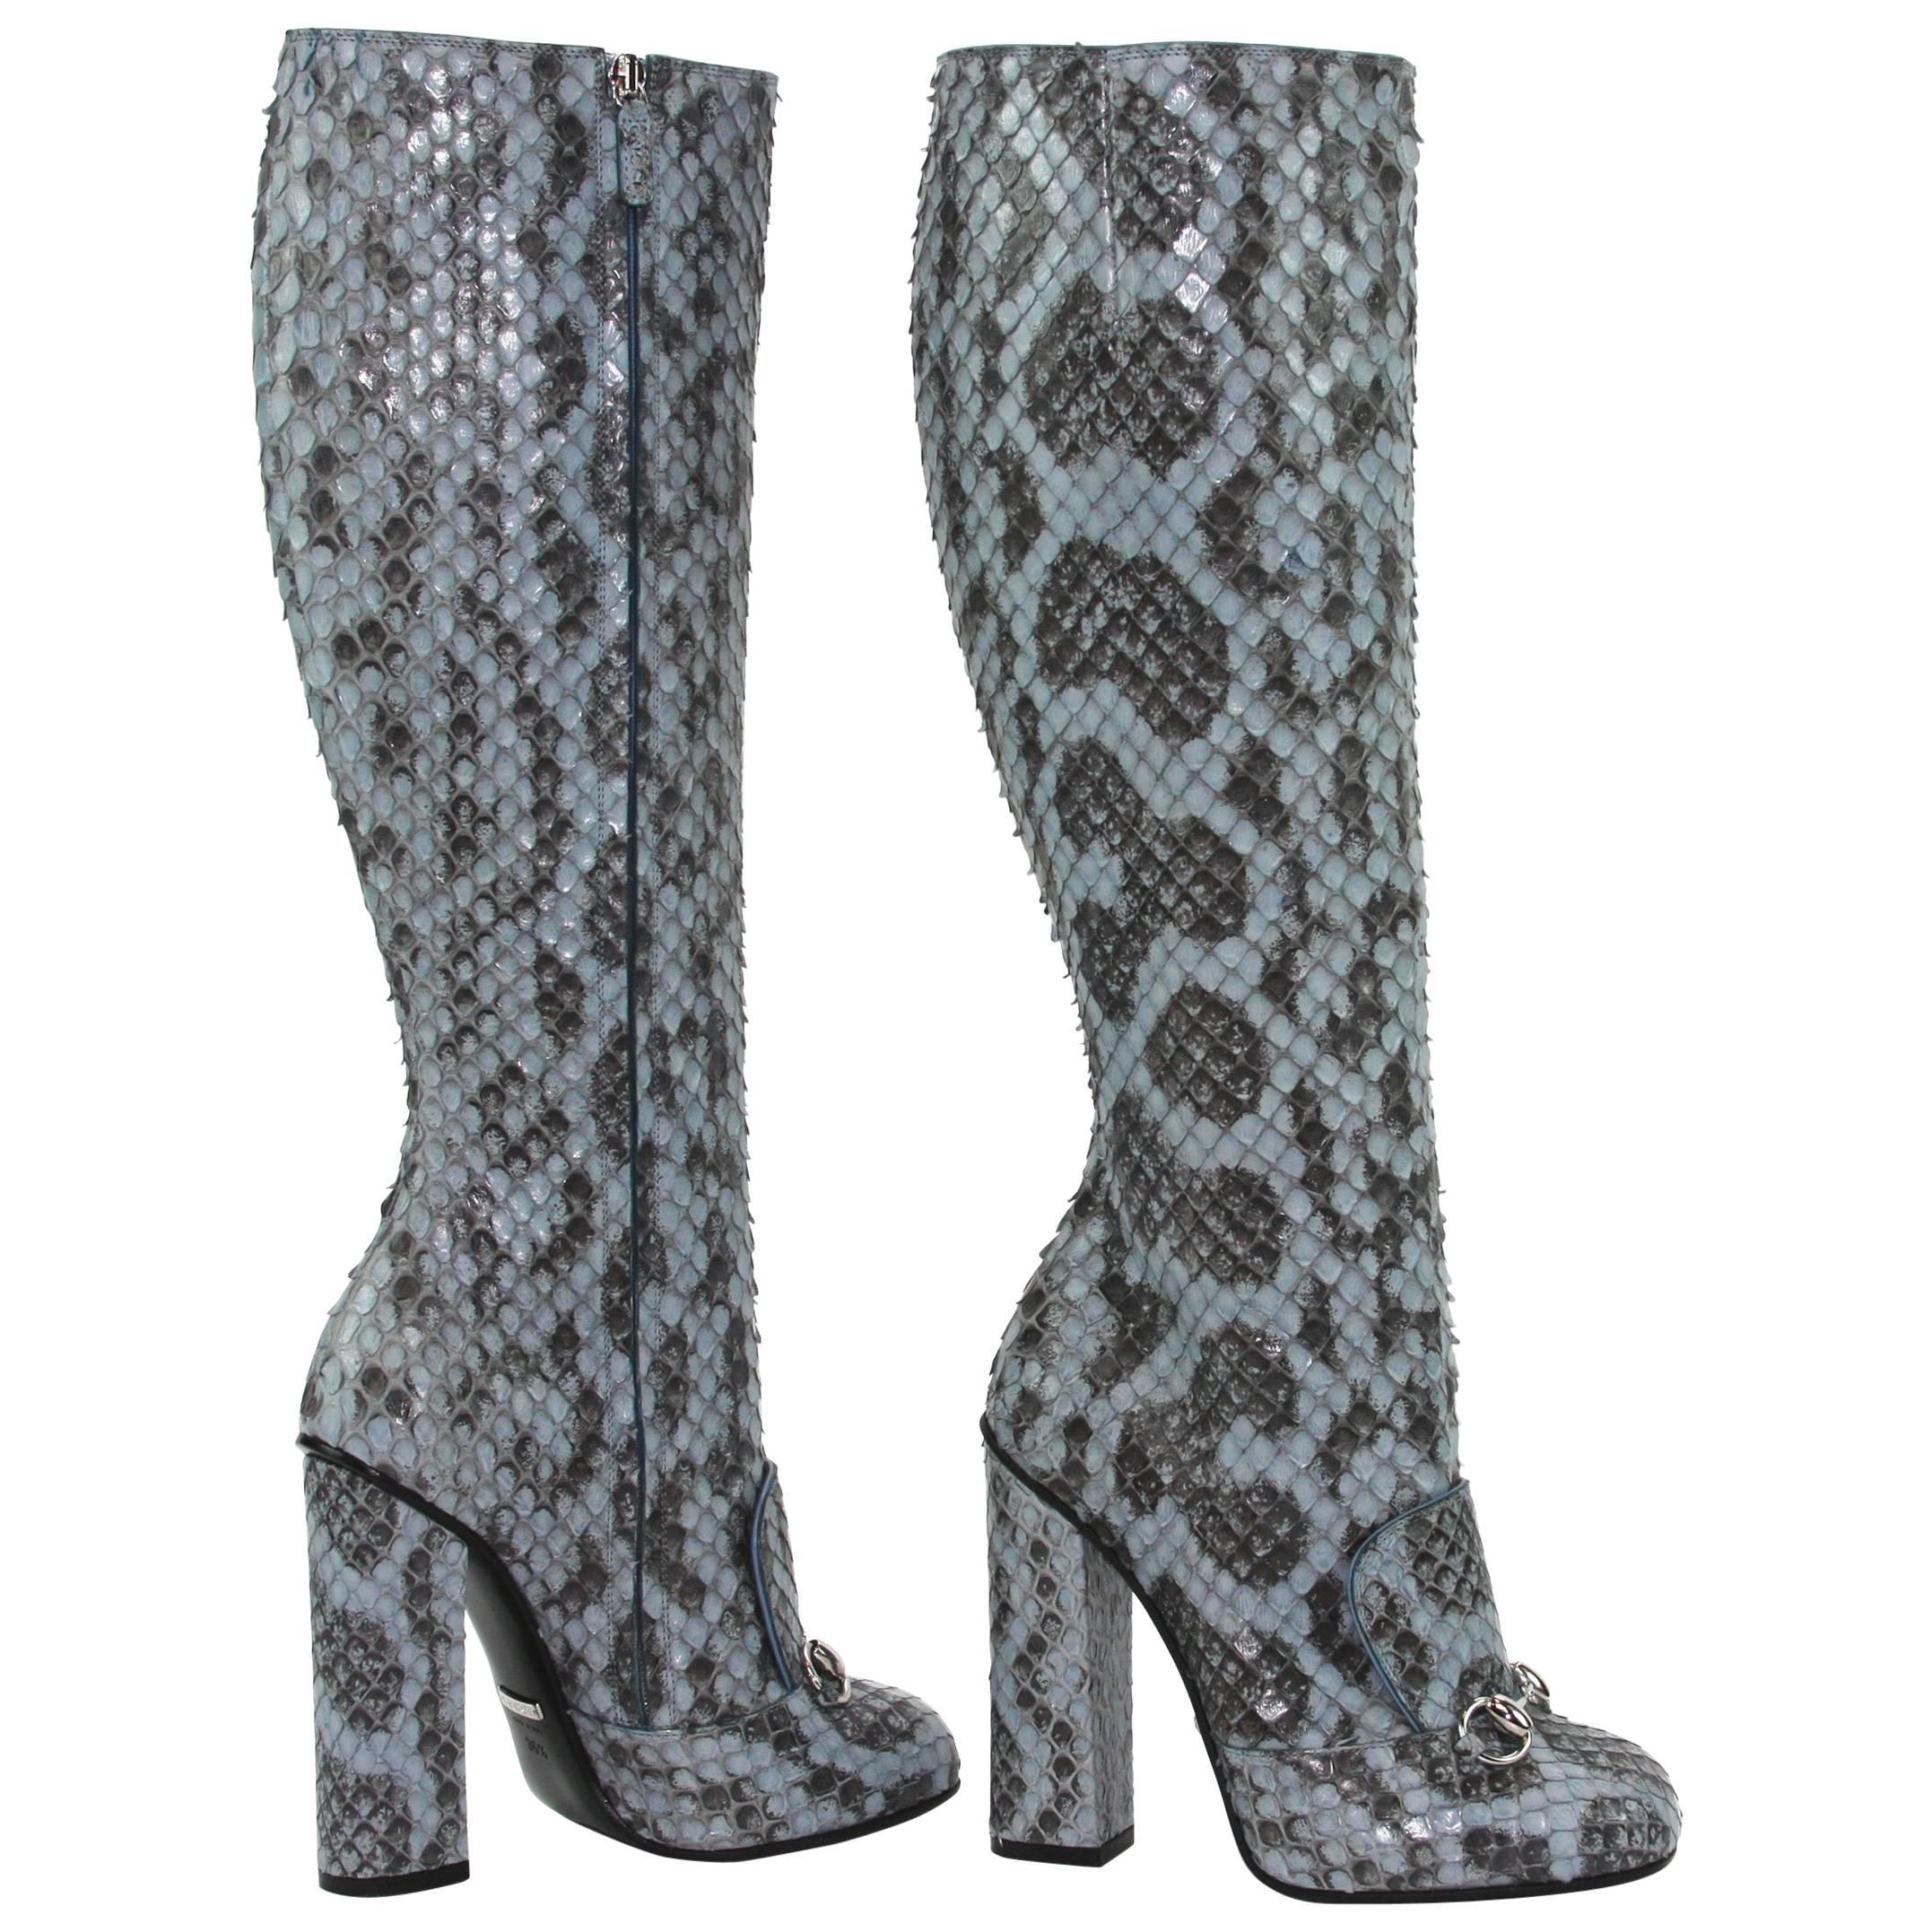 New GUCCI Campaign $3500 PYTHON Horsebit Knee High Boot Aquamarine 36.5 - 7